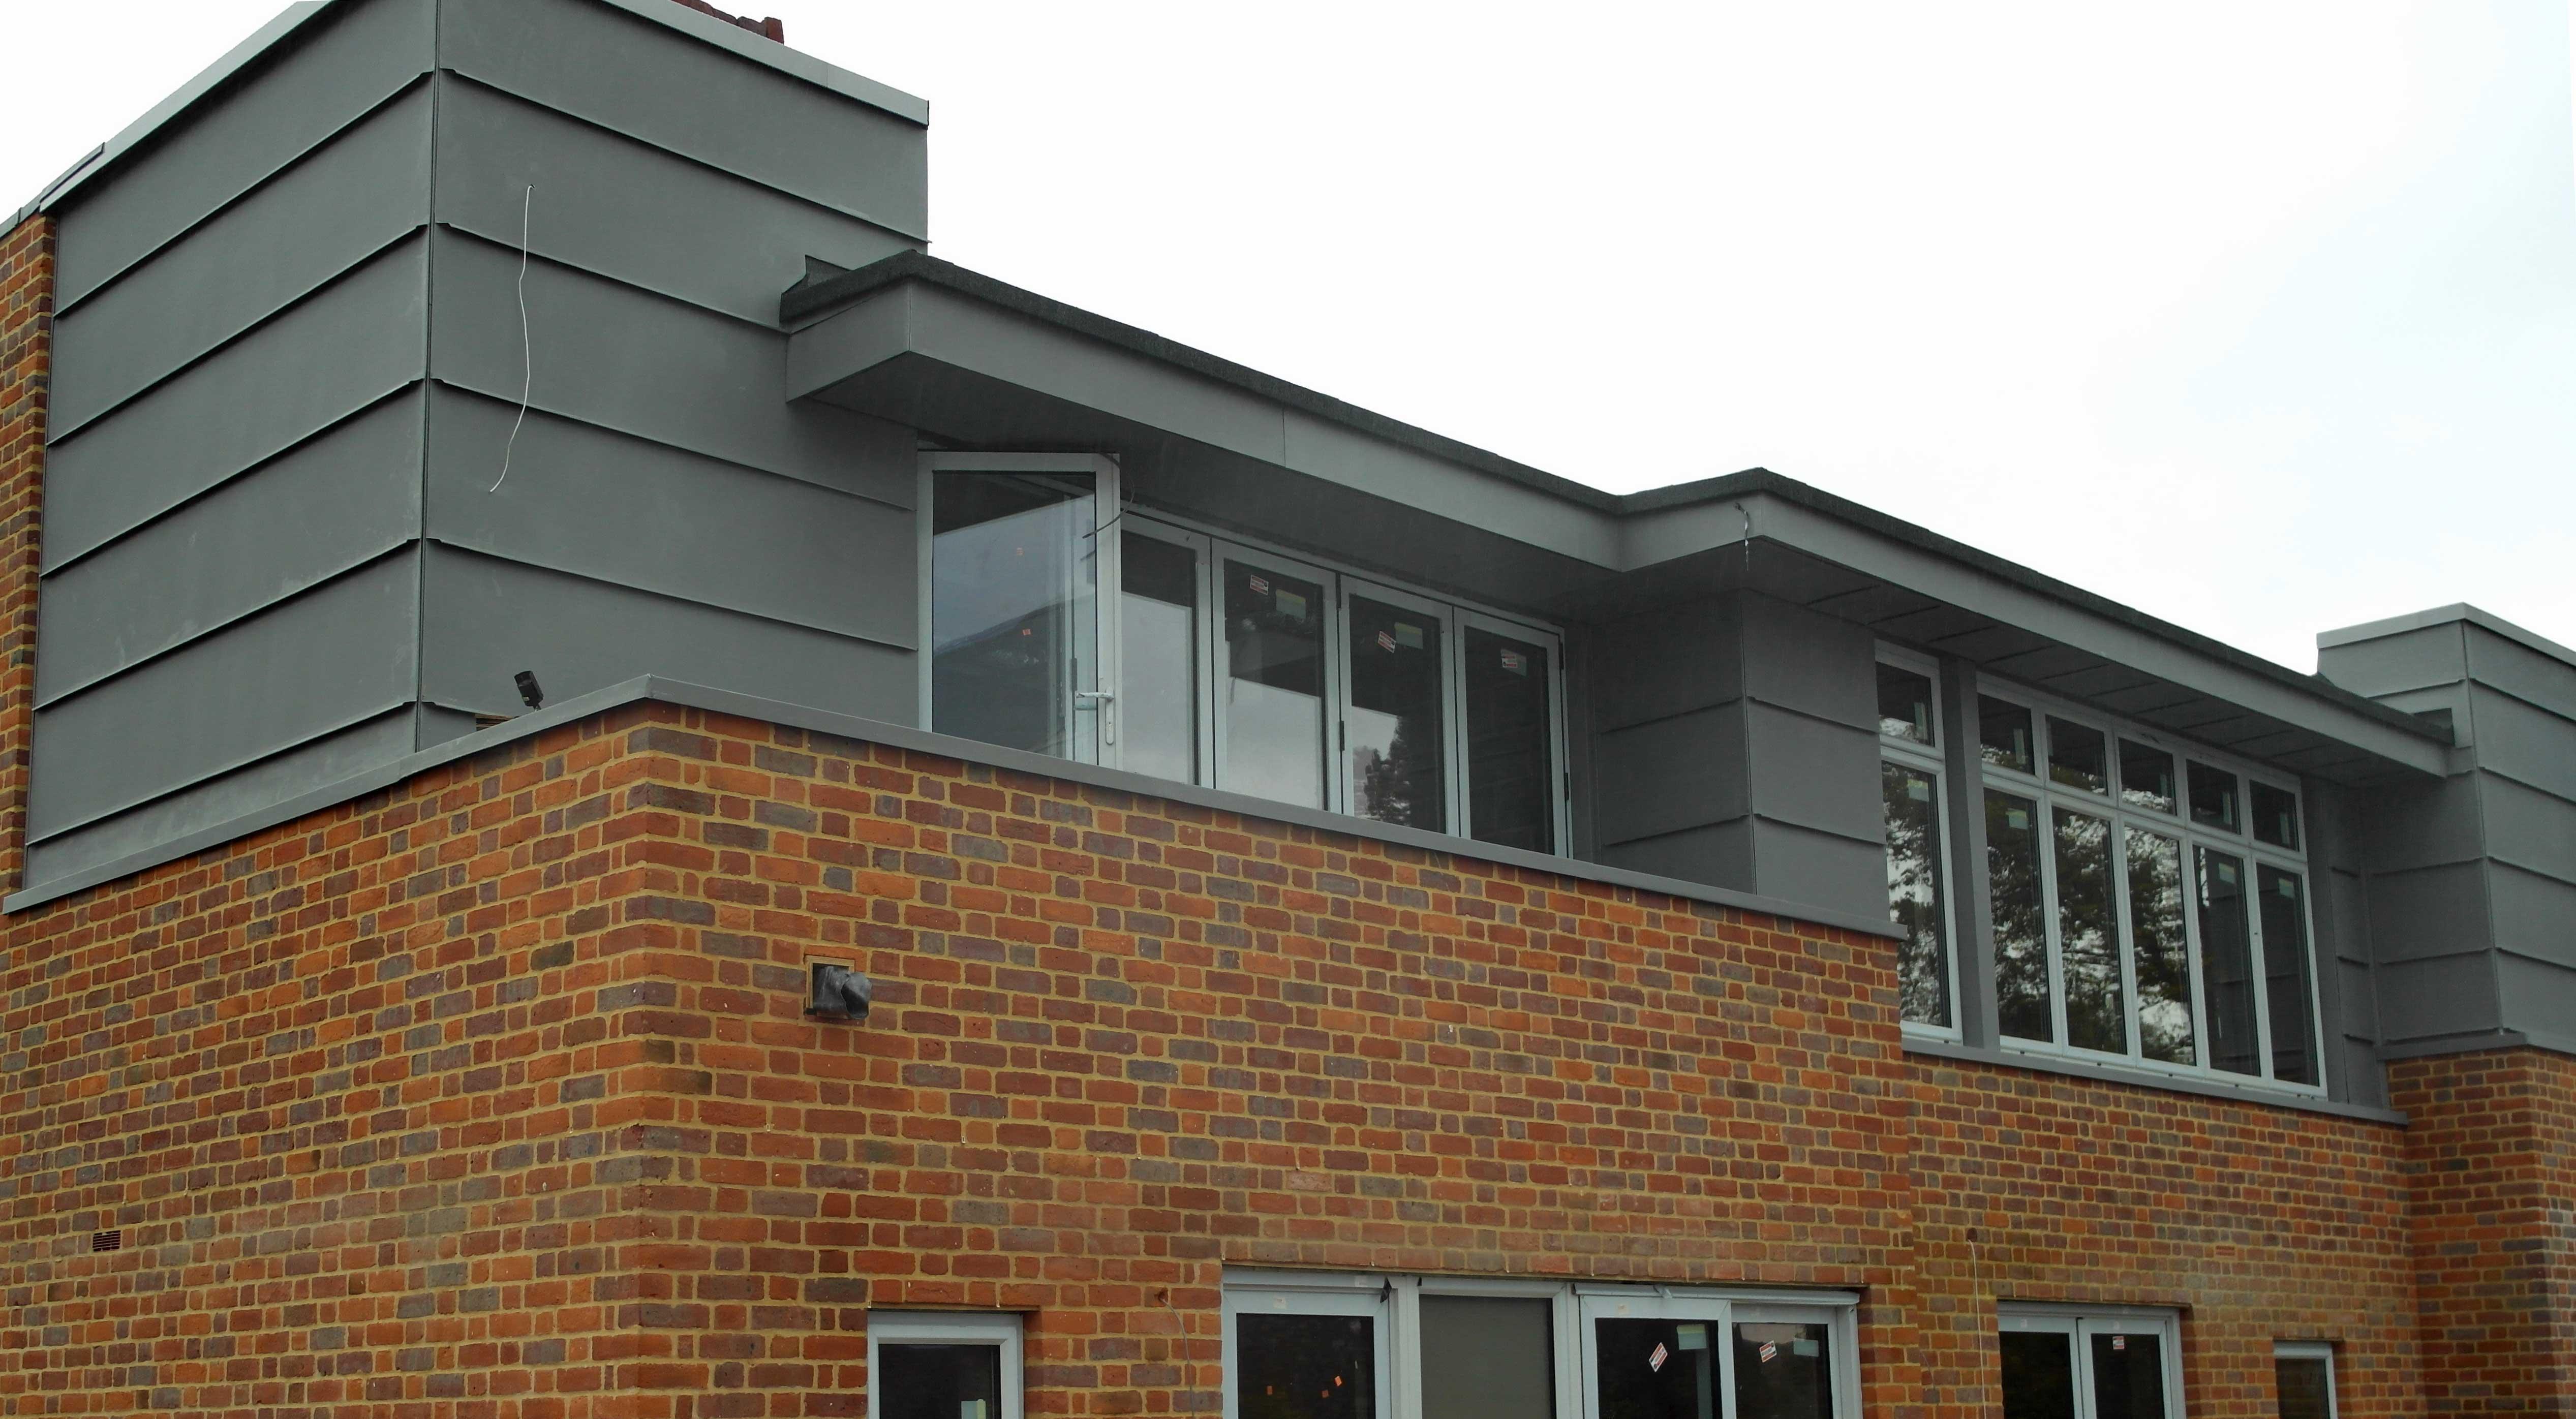 11 House Development In Canterbury Centre Metal Roof Ltd